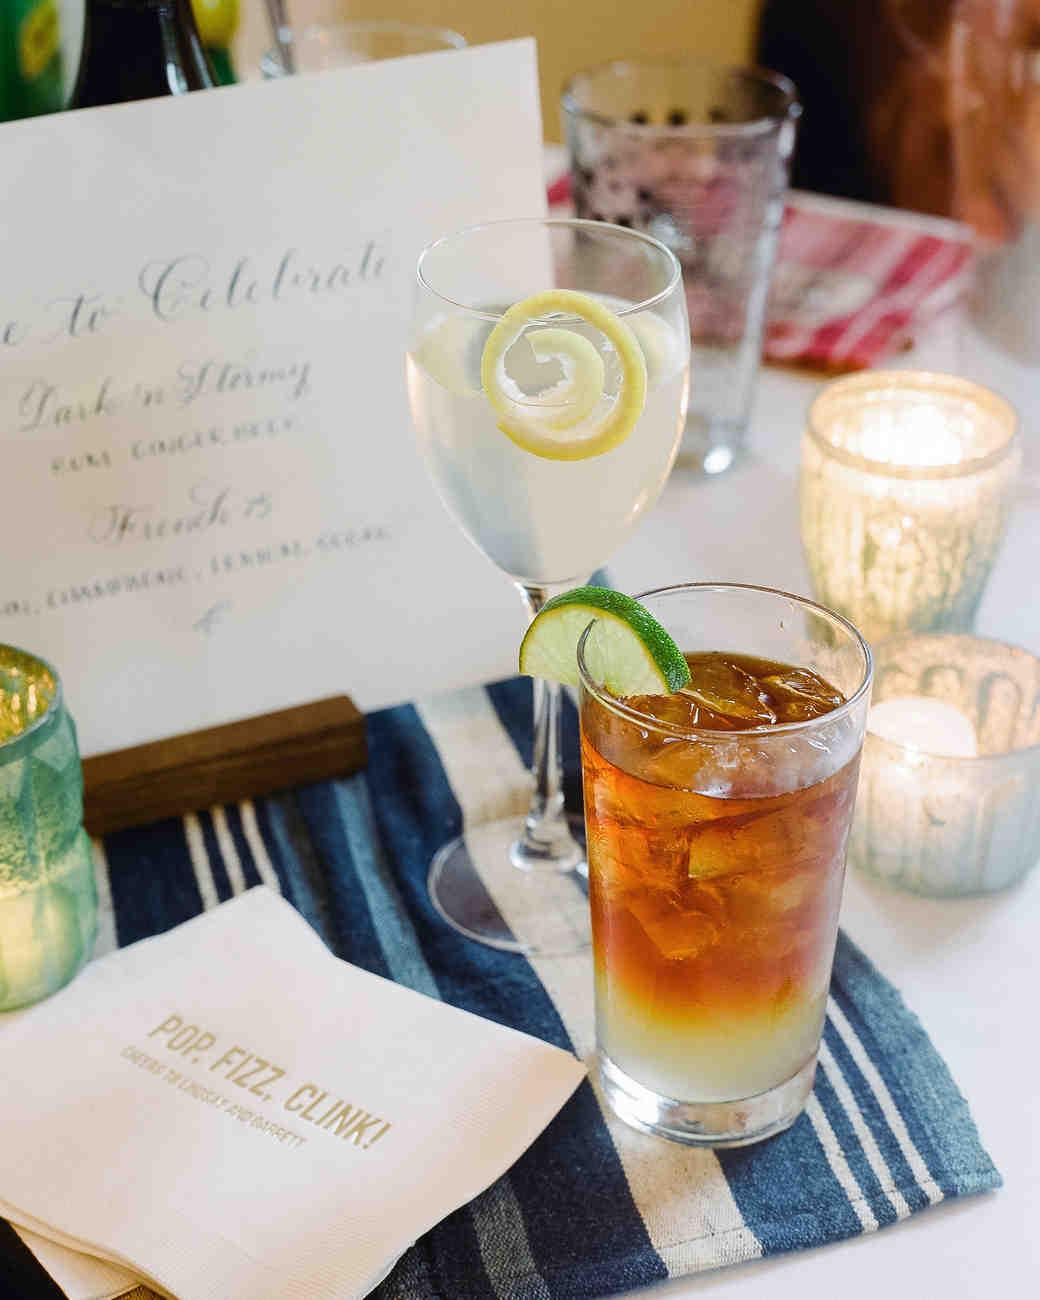 lindsay-garrett-wedding-cocktails-0638-s111850-0415.jpg